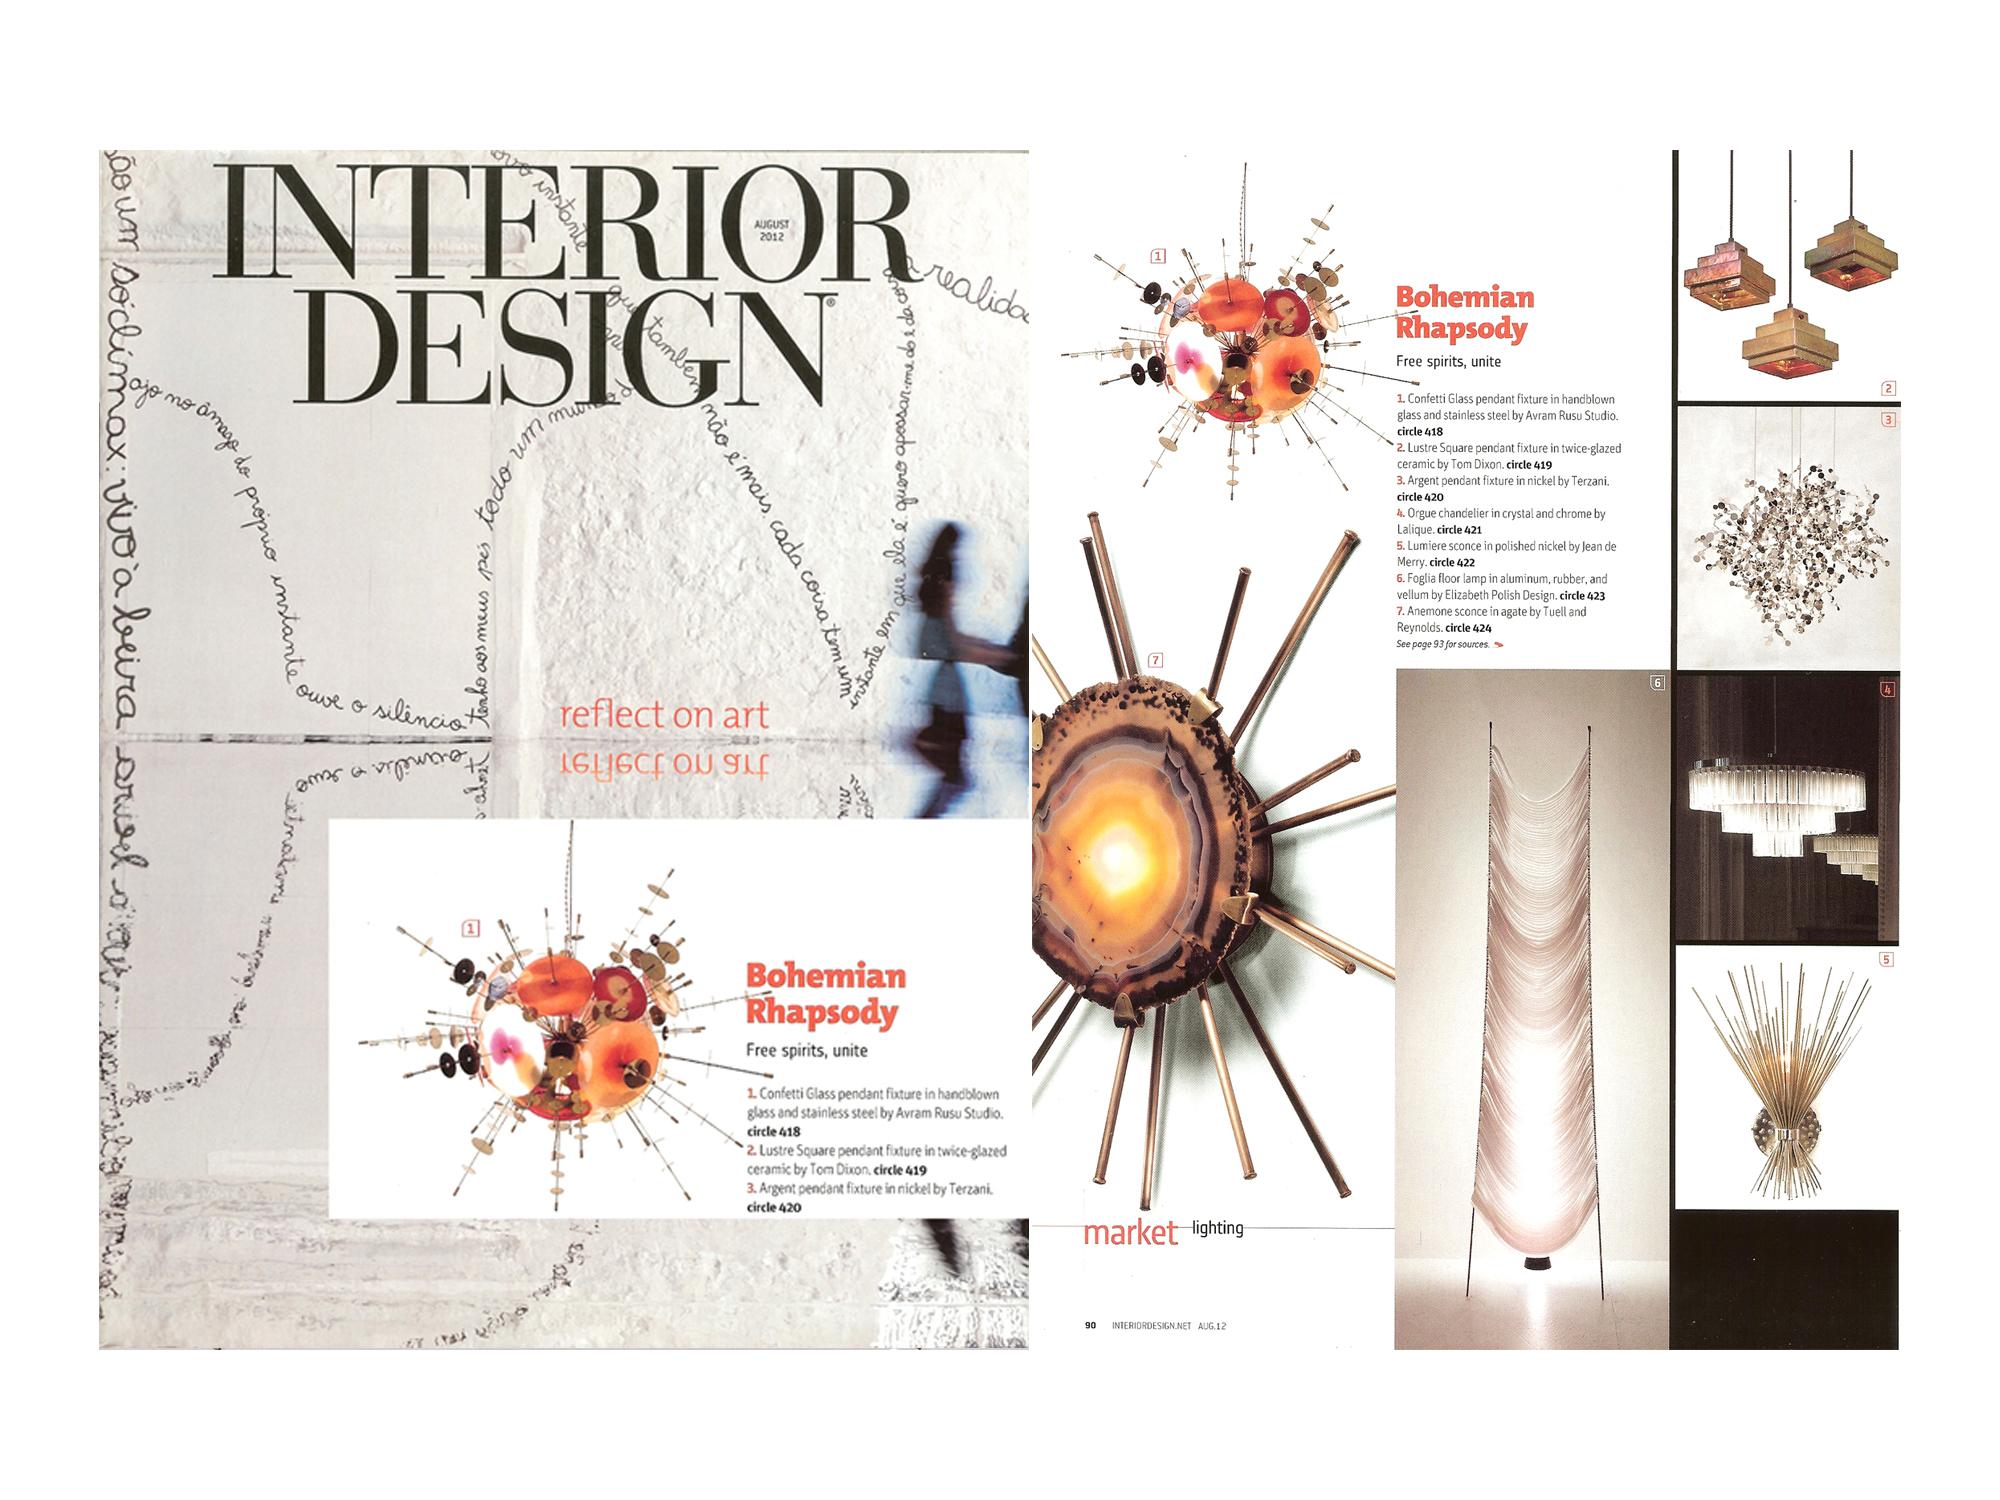 Avram_Rusu_Interior_Design_4_Press_Page.jpg